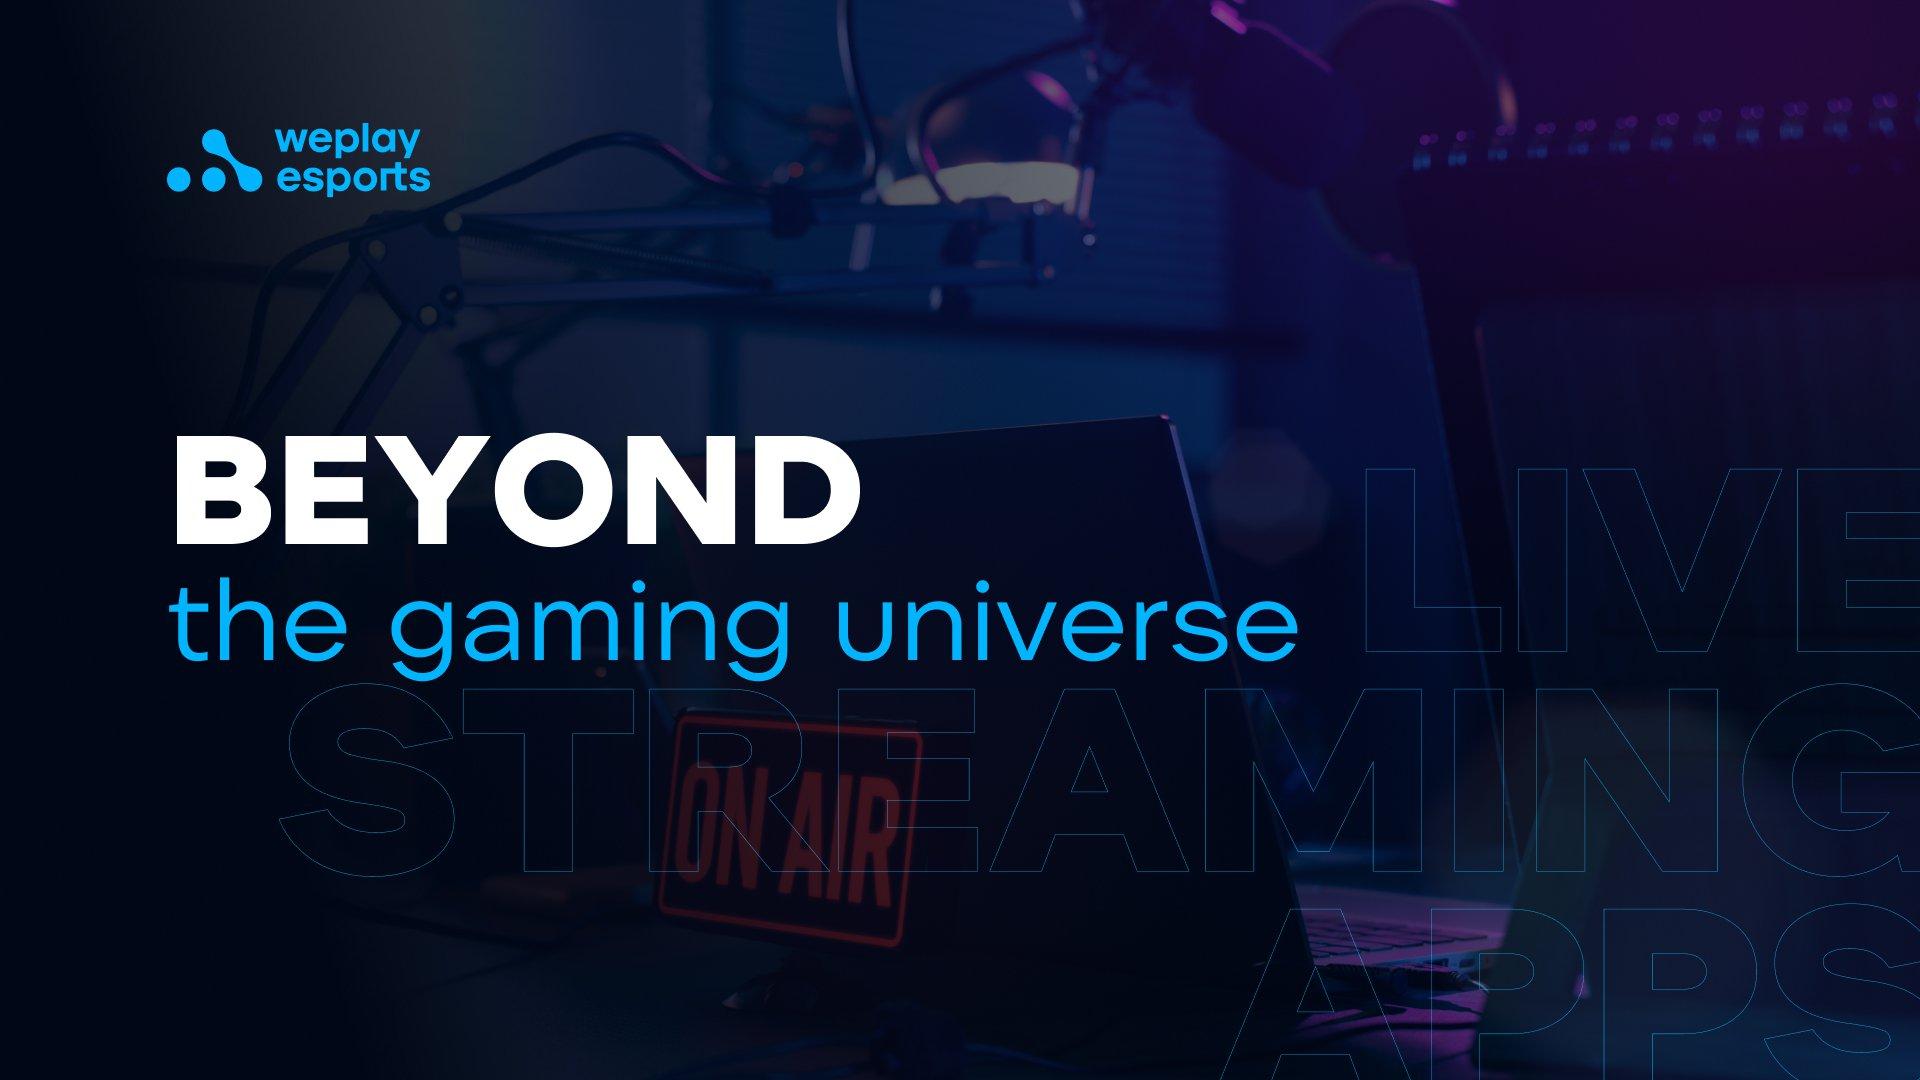 Beyond the gaming universe